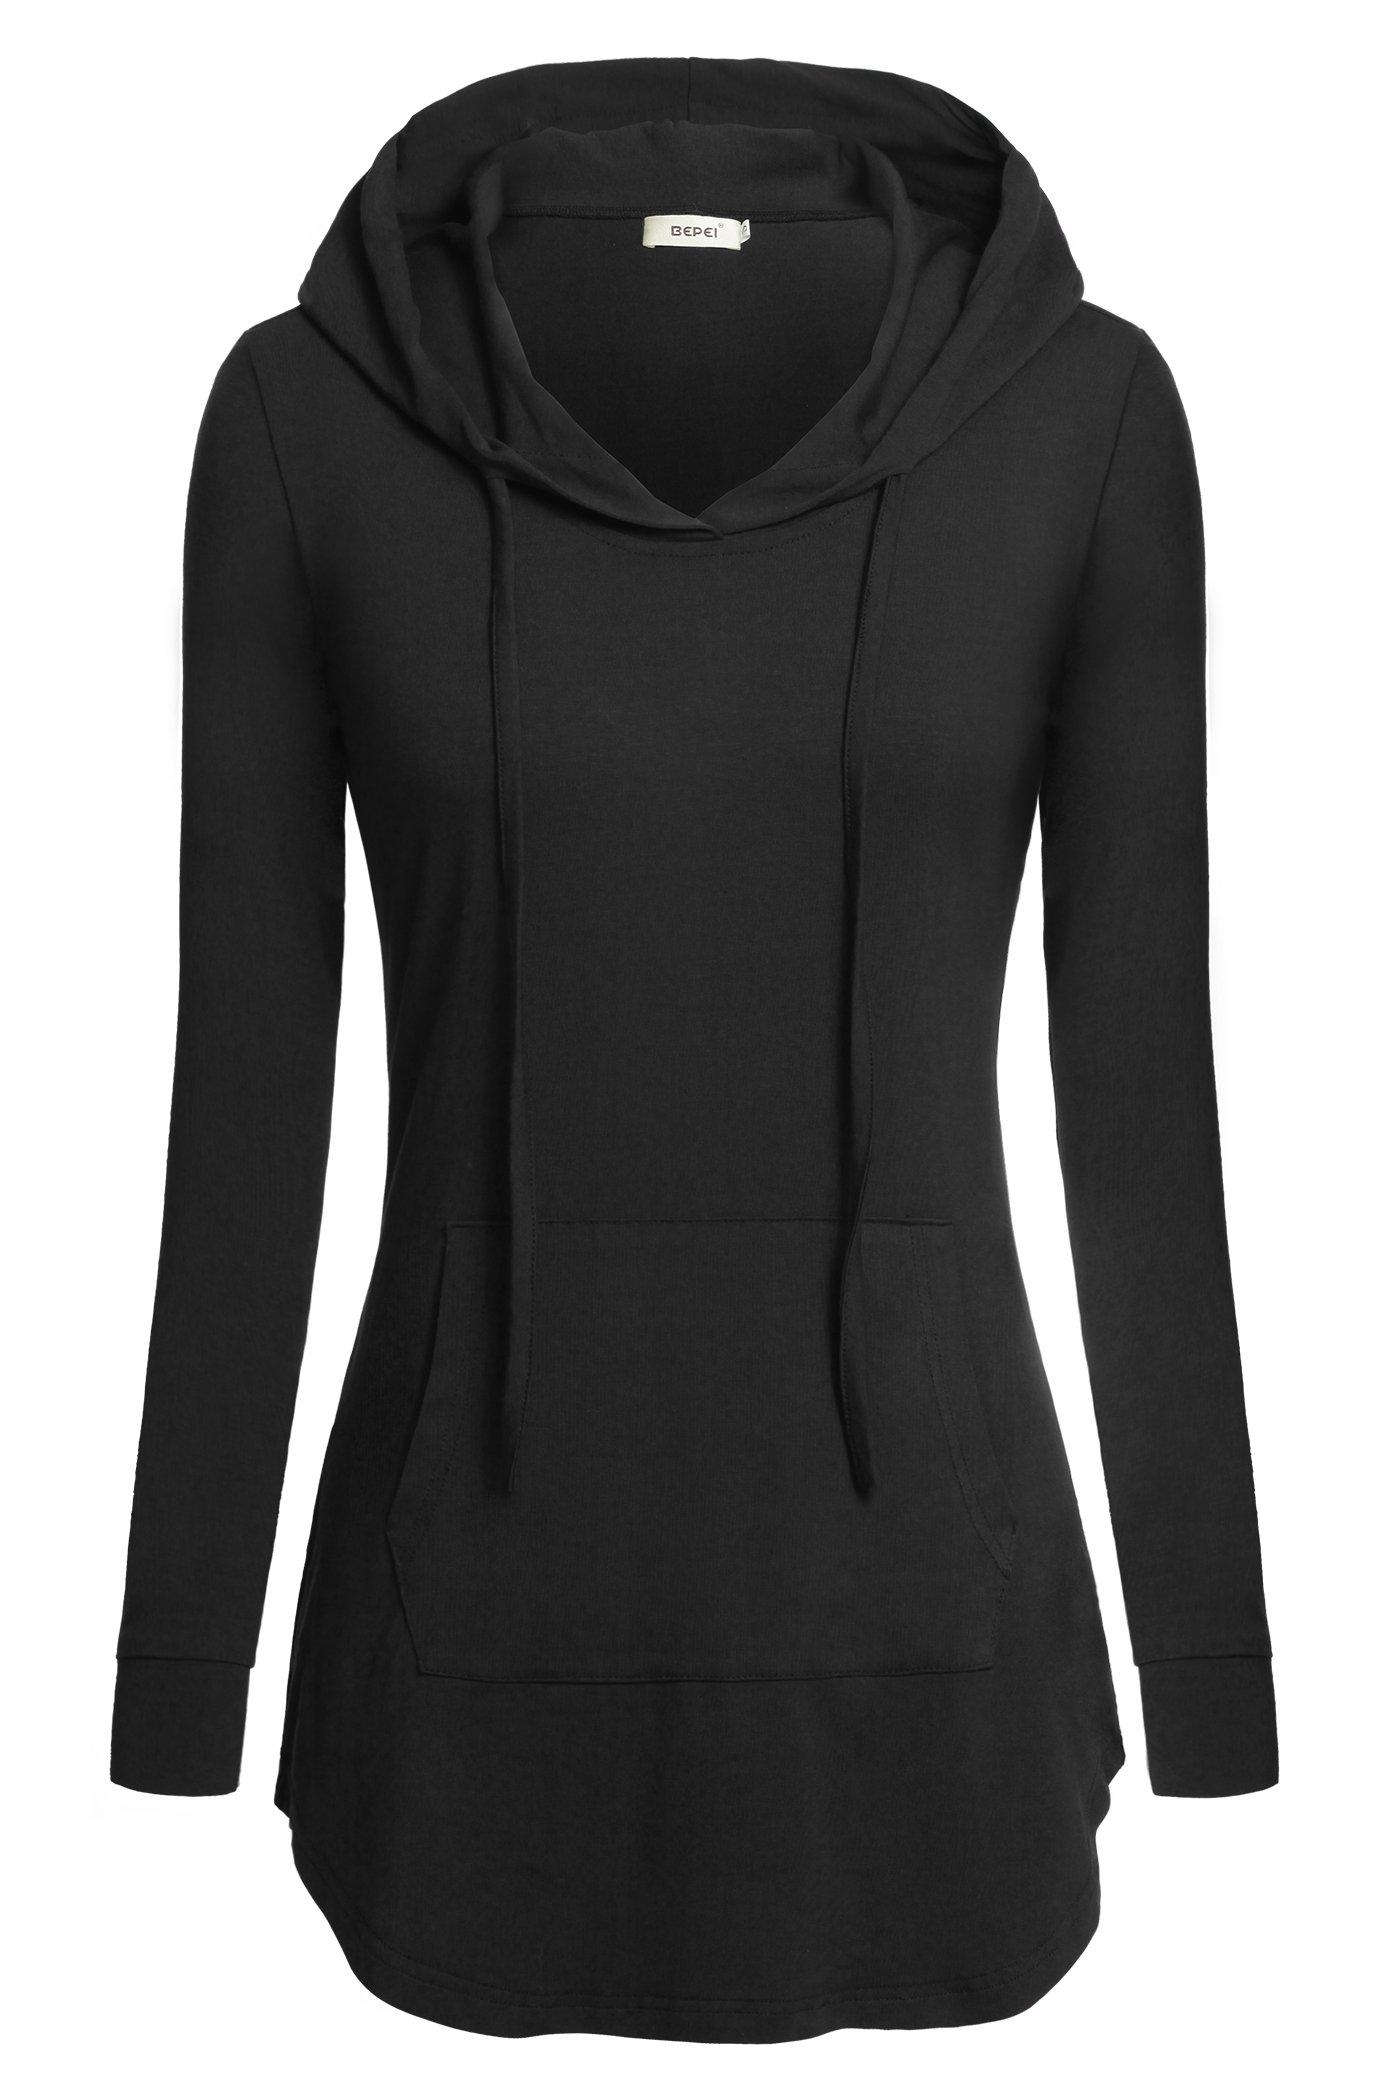 BEPEI Women Shirts, Hoody Sweatshirt Long Sleeves Business Office Blouse Black XL